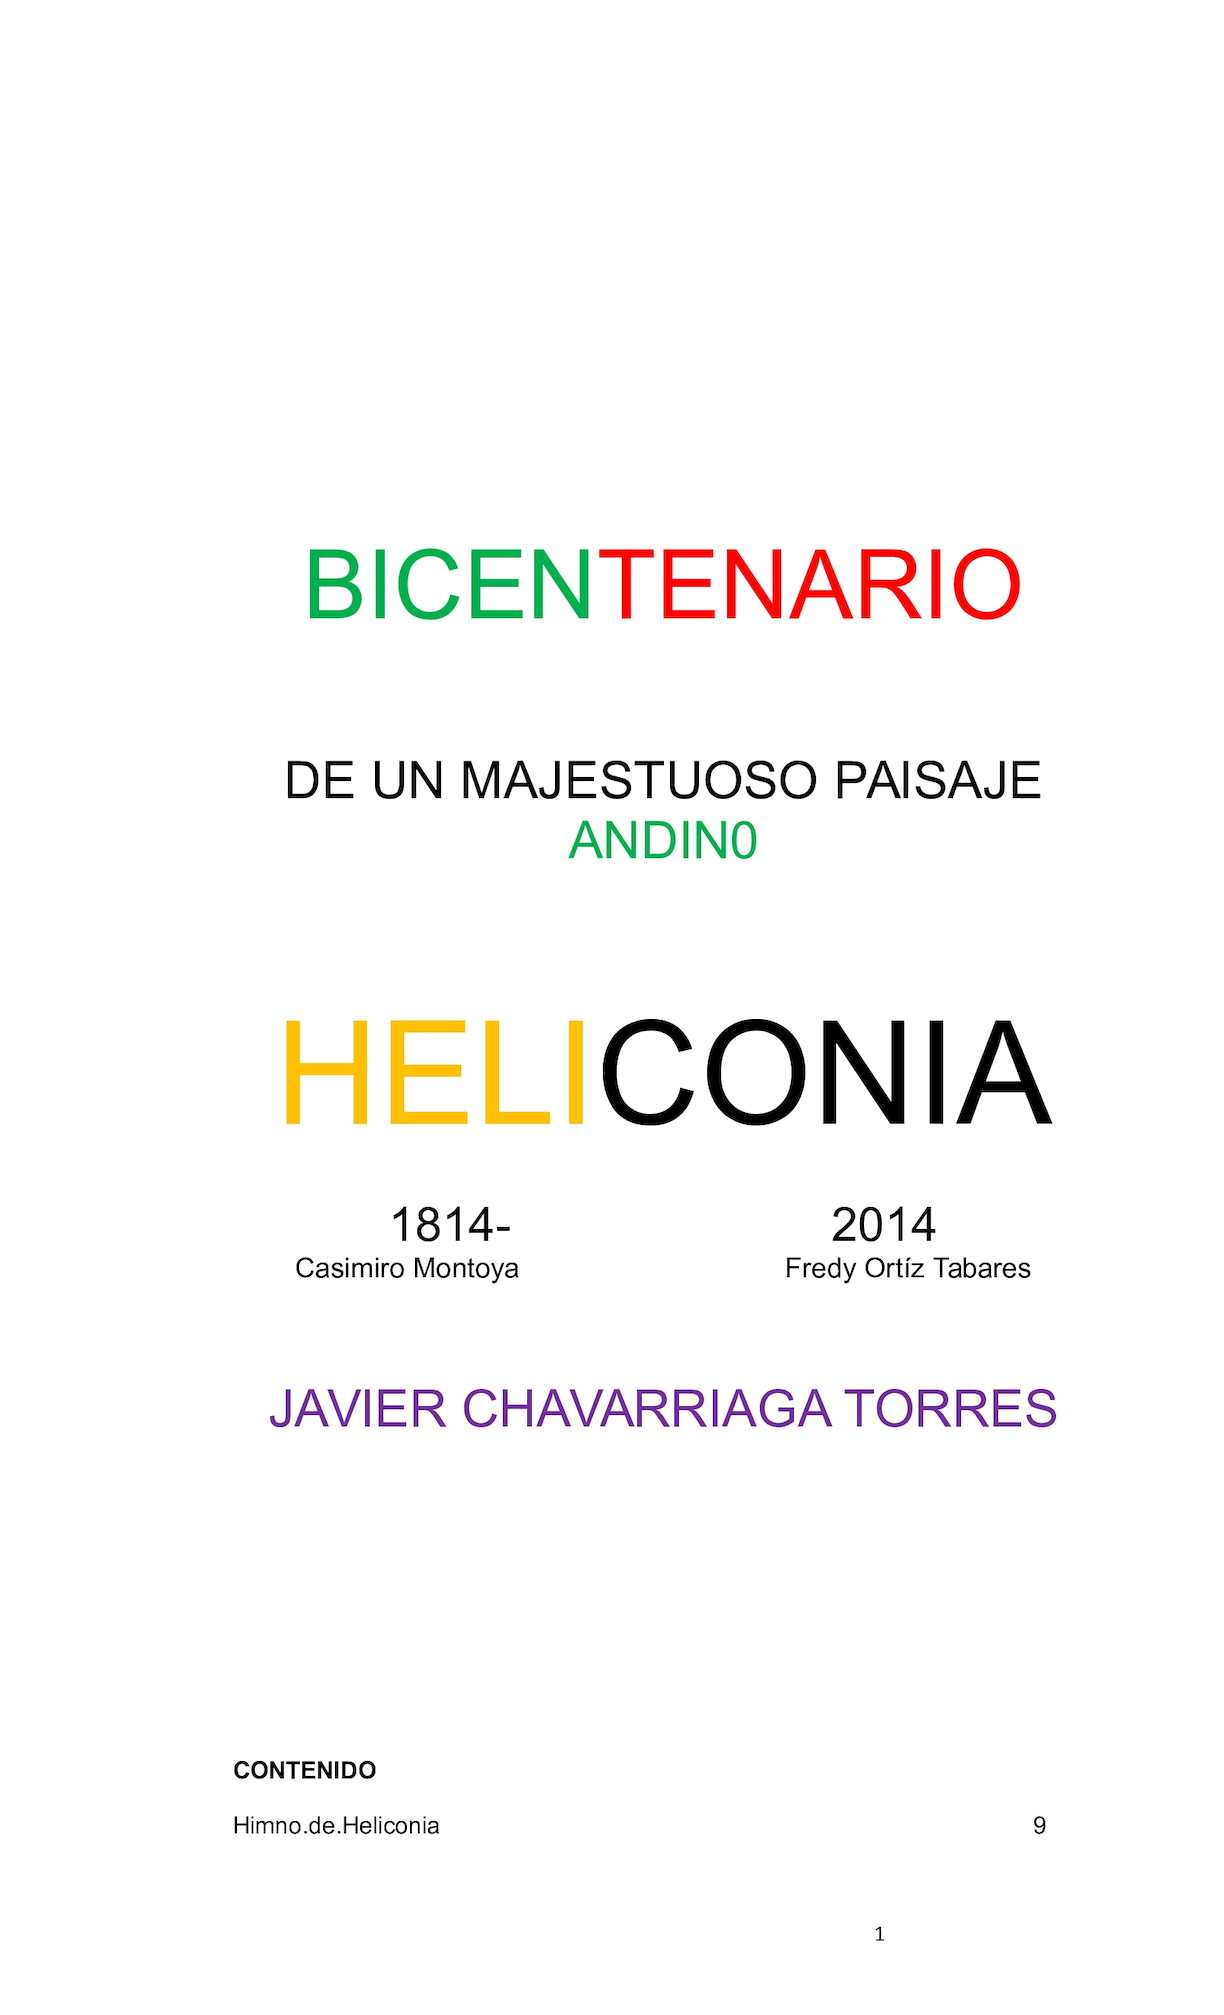 Calaméo - Bicentenario De Un Majestuoso Paisaje Andino (2)